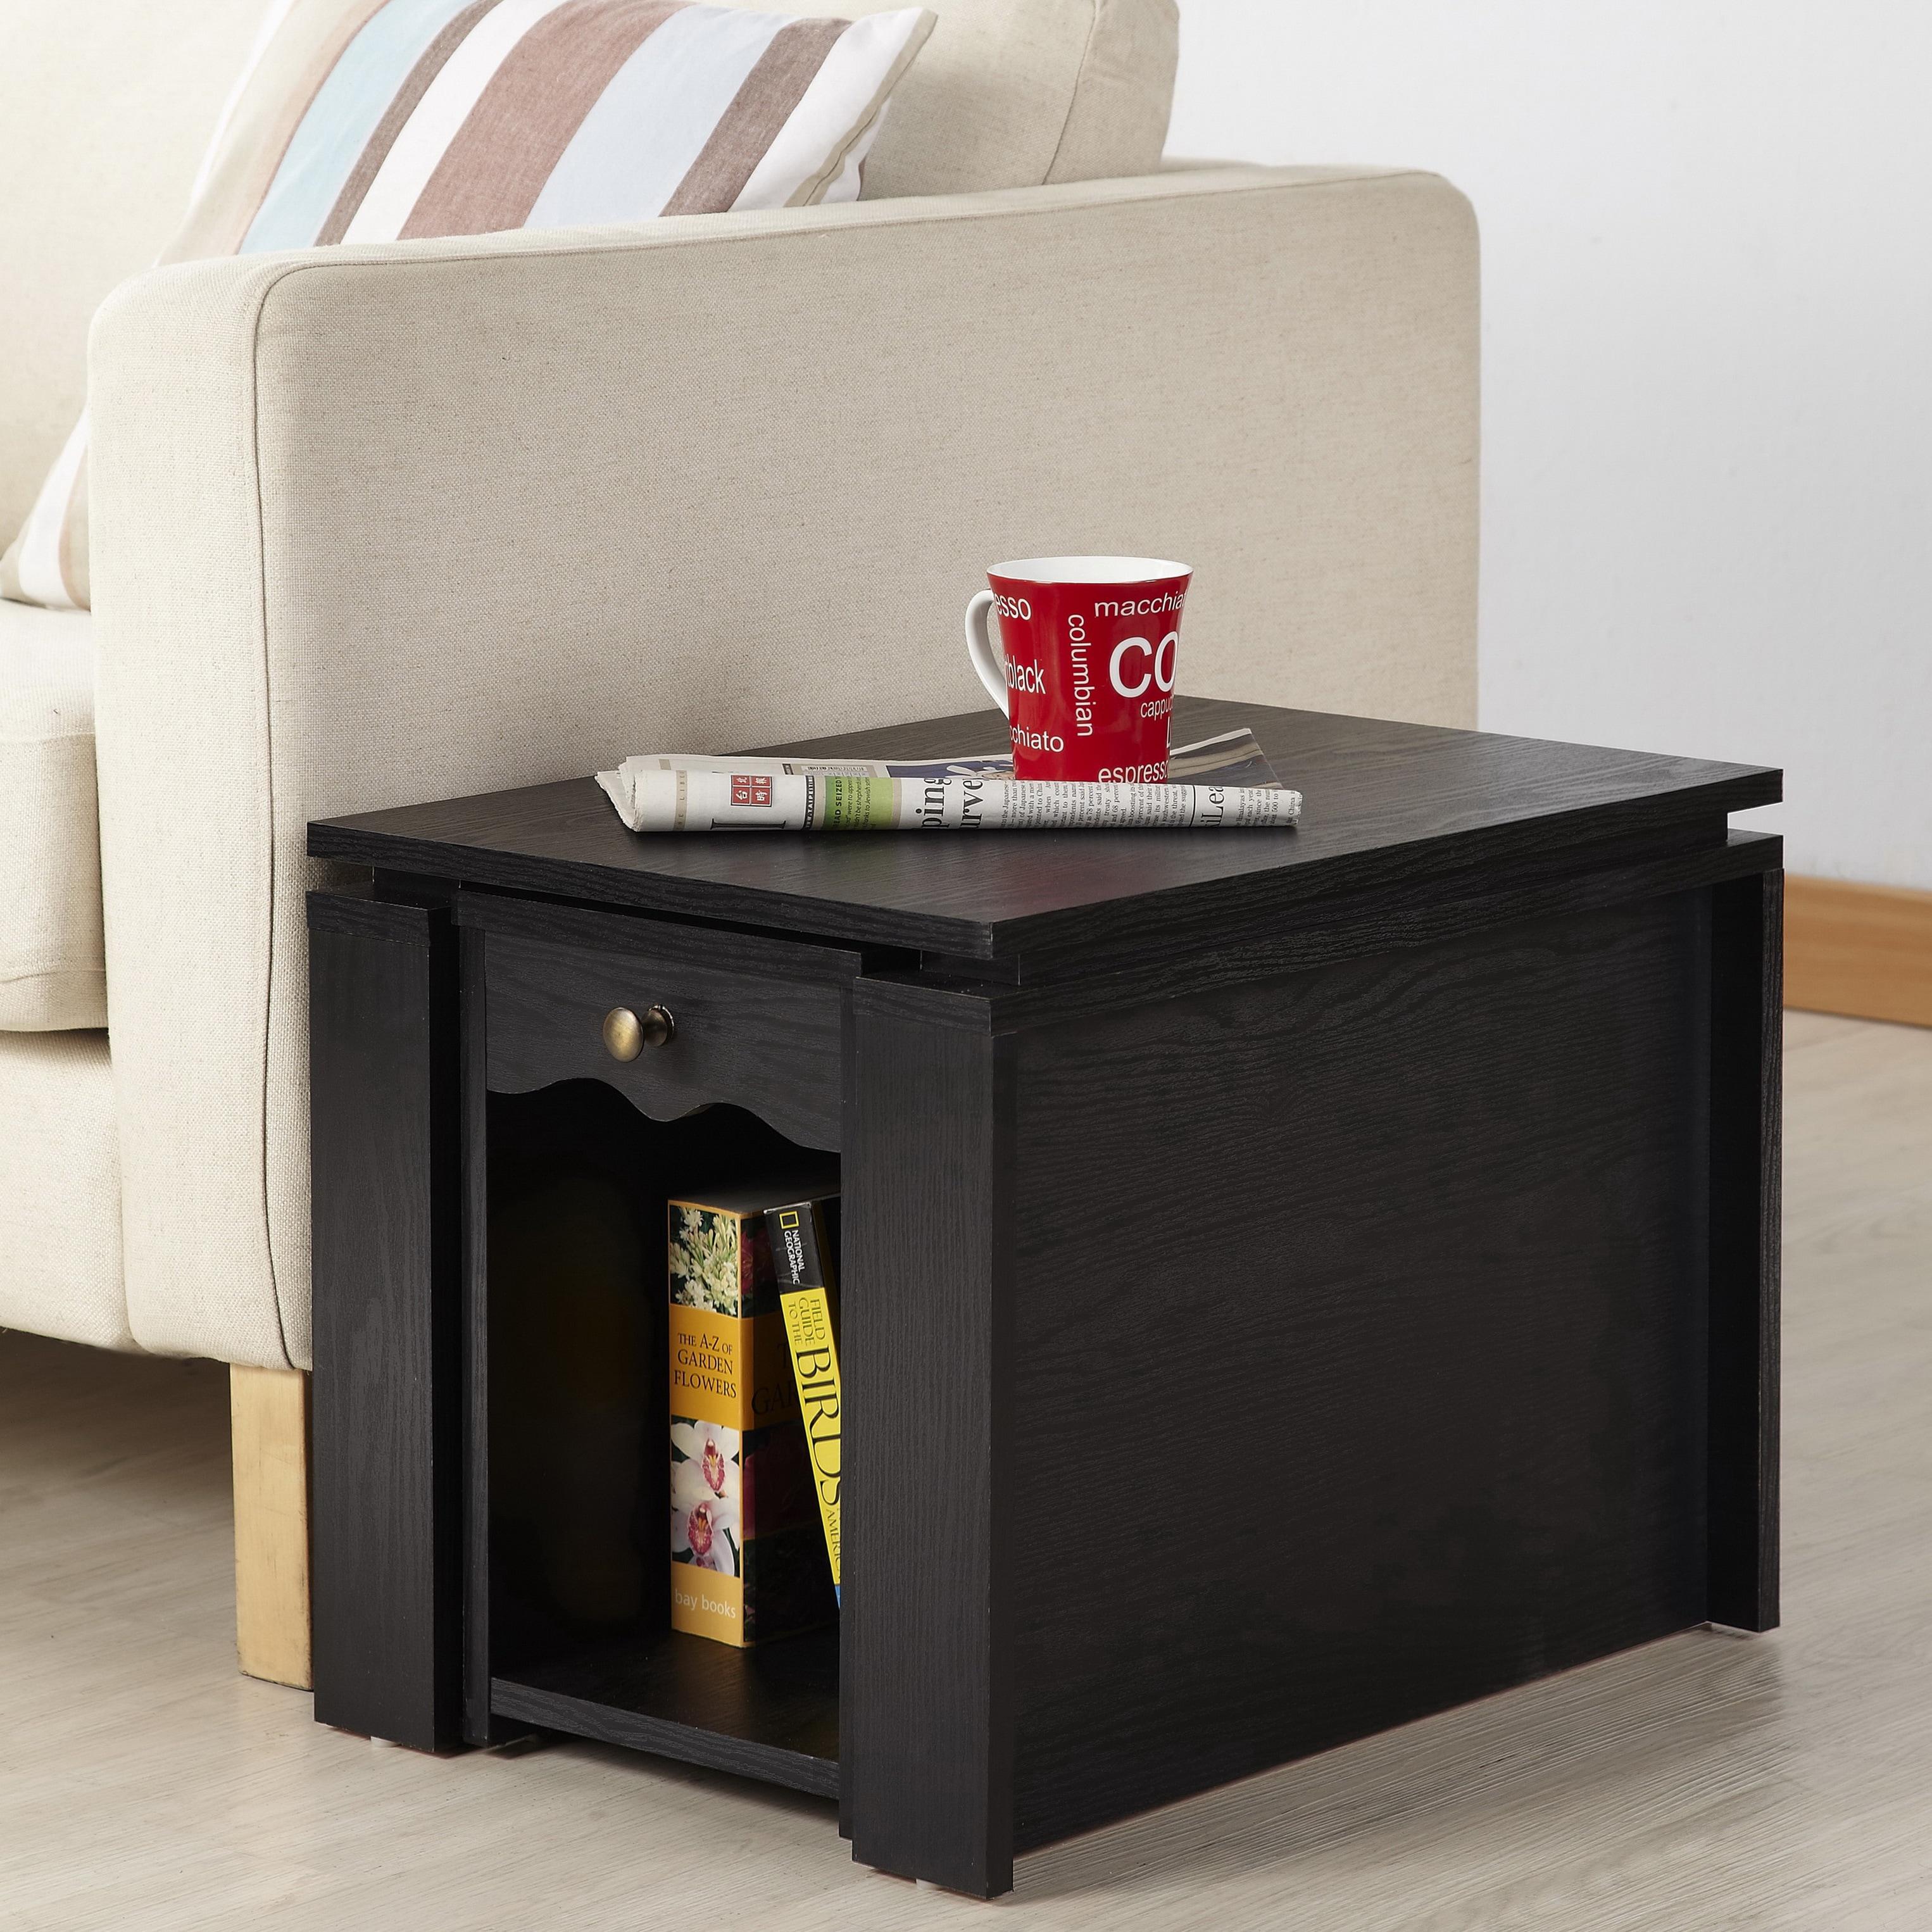 Shop Furniture of America Propel Contemporary 2 in 1 Black Finish